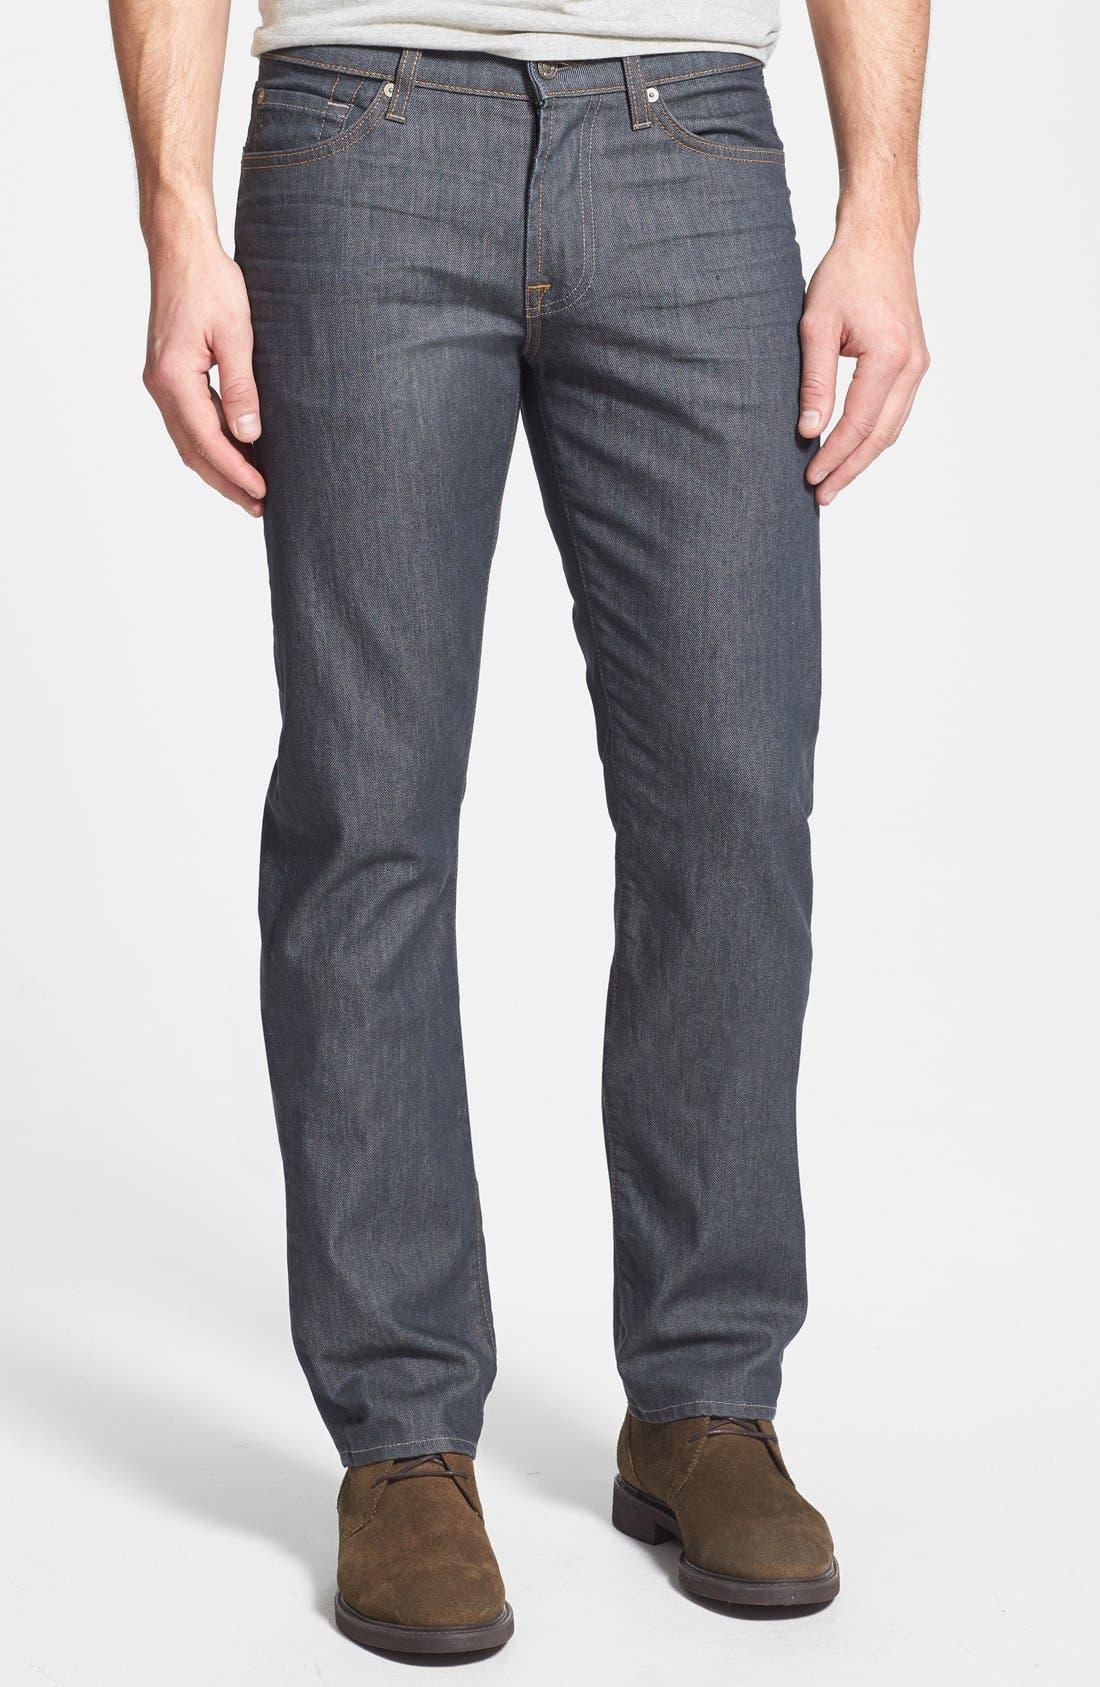 Main Image - 7 For All Mankind® 'Slimmy' Slim Straight Leg Jeans (Summer Haze)